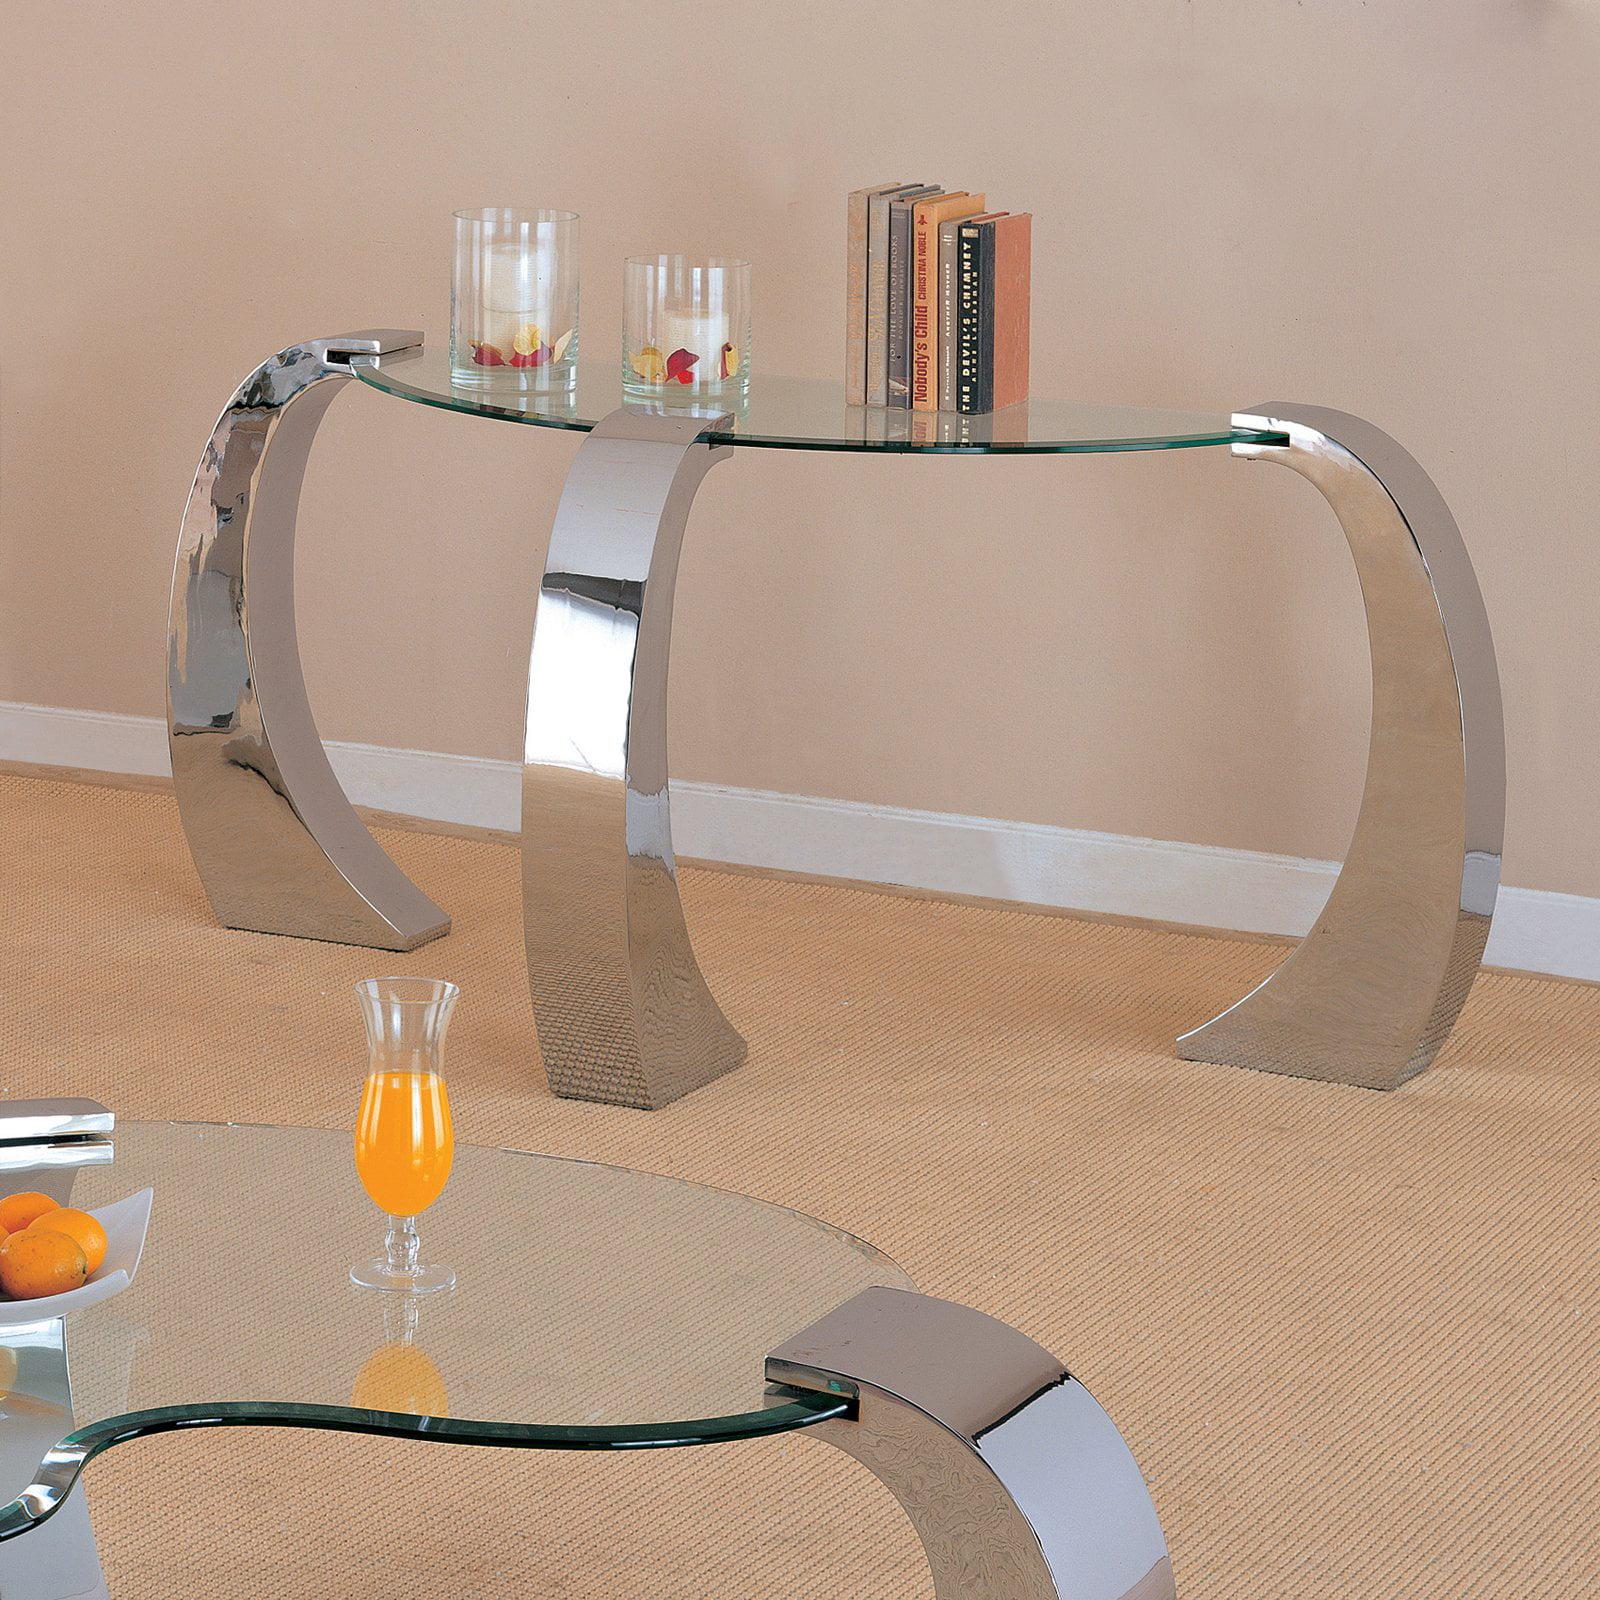 Coaster Furniture Glass Top Console Table - Chrome